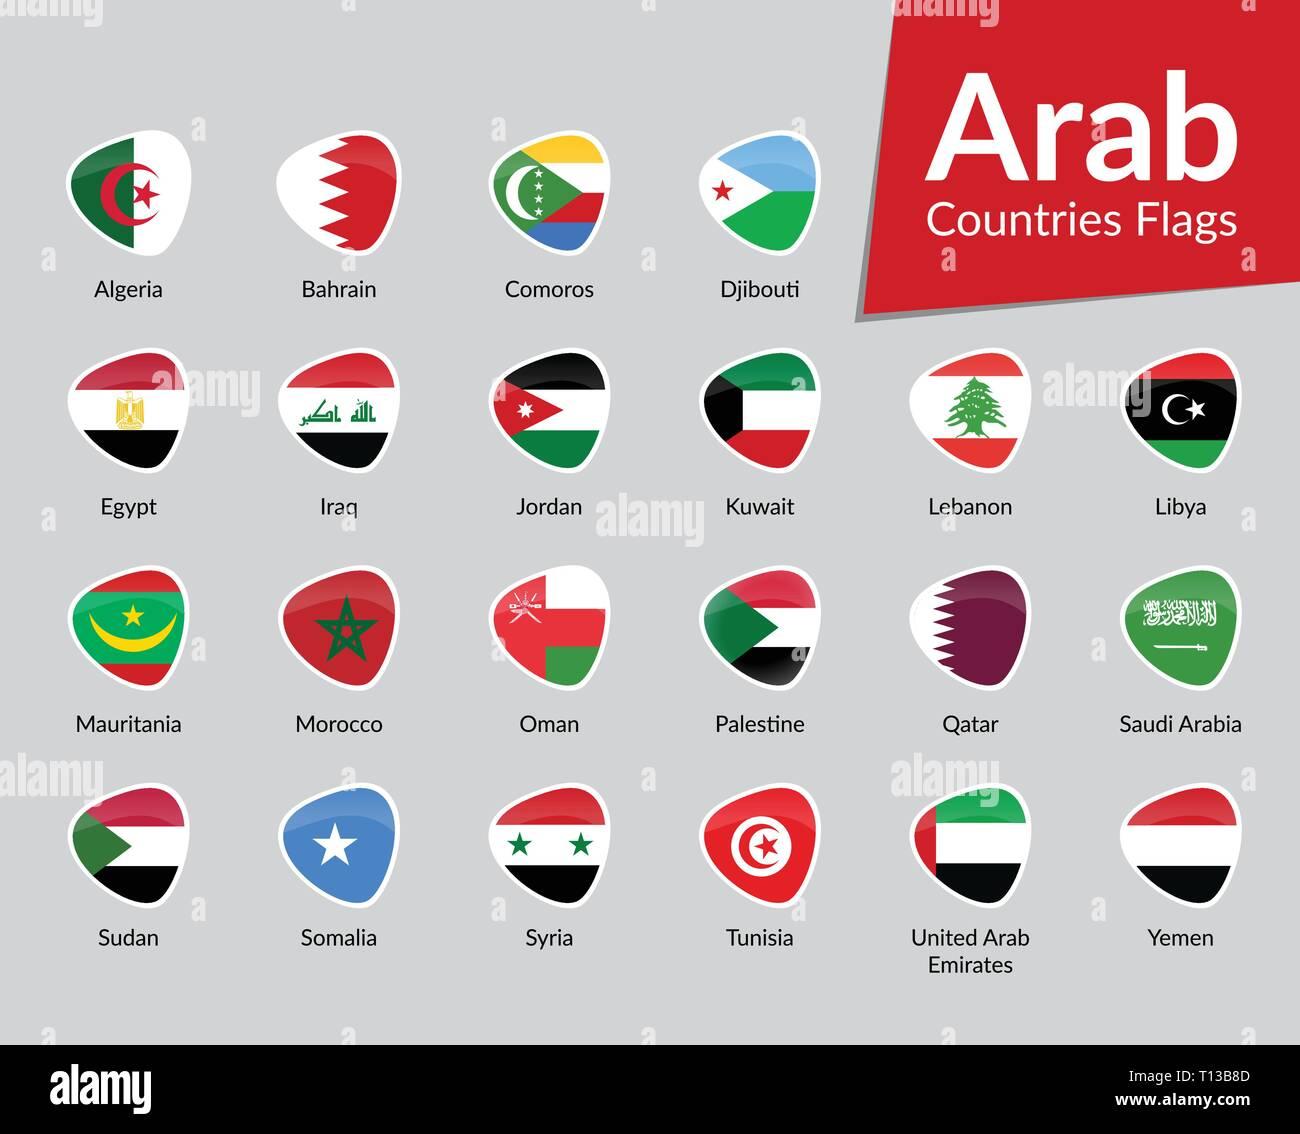 Dating-Standorte in den arab-Ländern